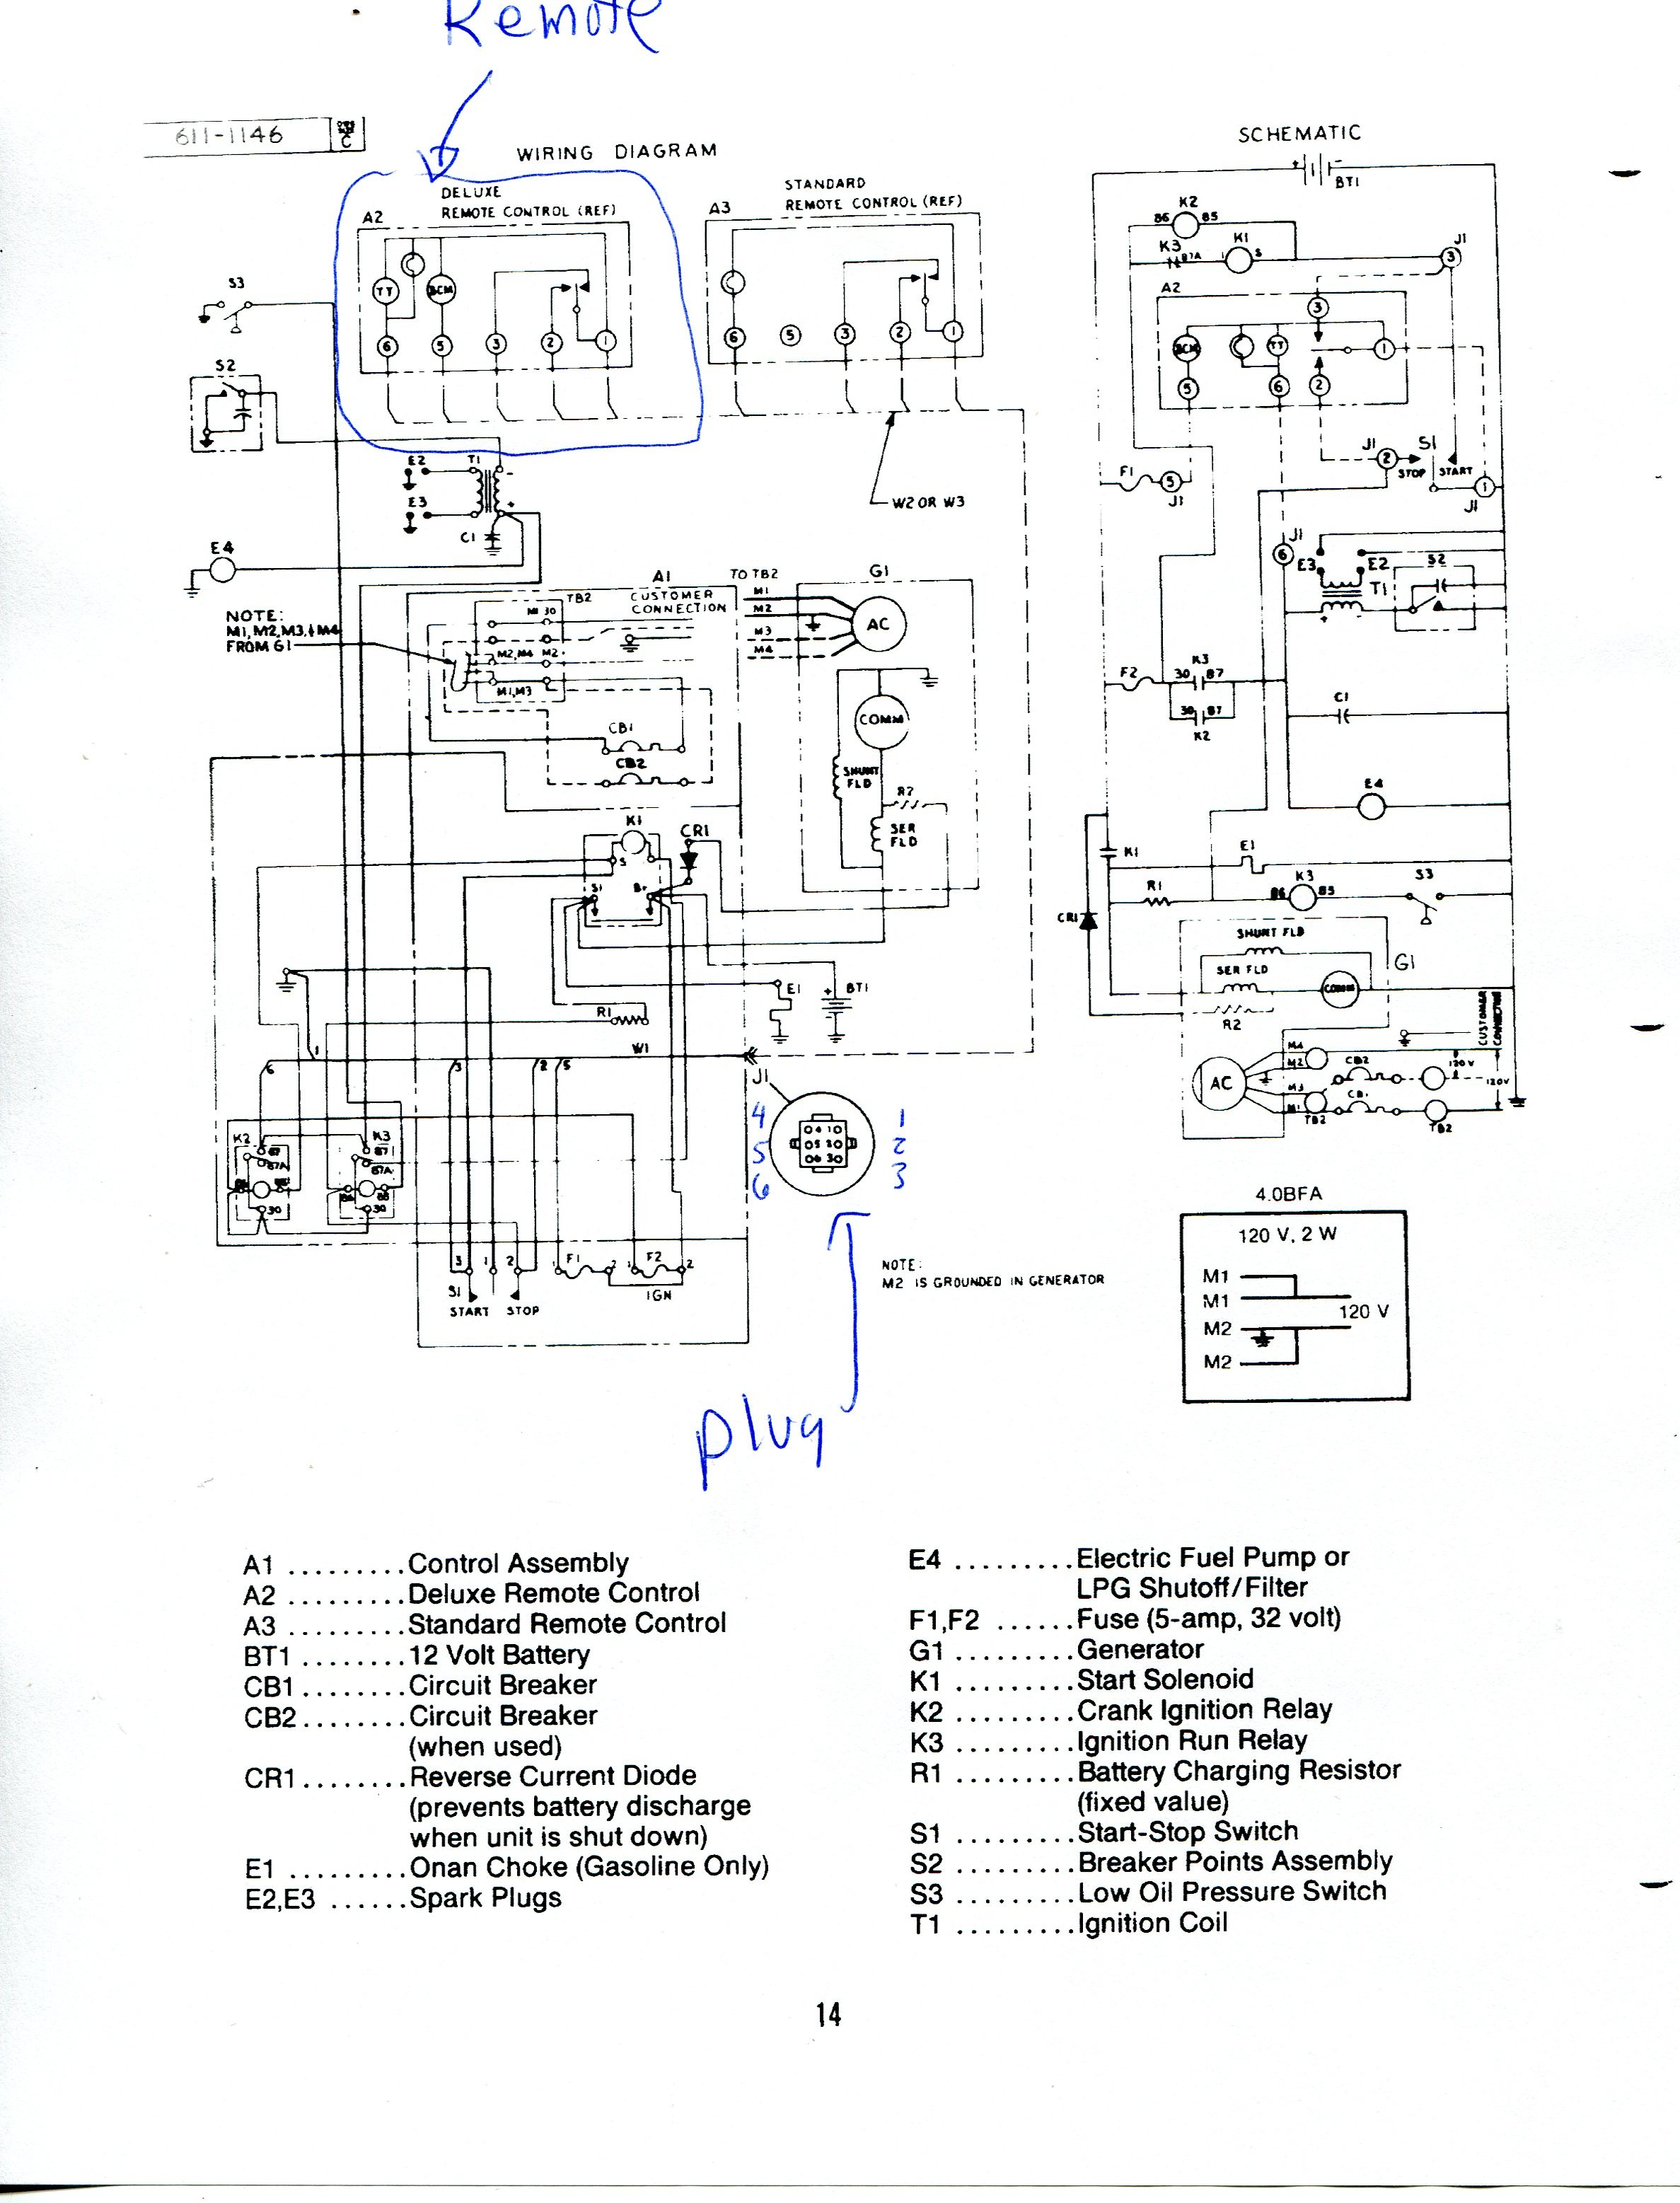 Kohler Voltage Regulator Wiring Diagram An Wiring Diagram An Wiring Diagram 611 1267 Wiring Diagrams Of Kohler Voltage Regulator Wiring Diagram